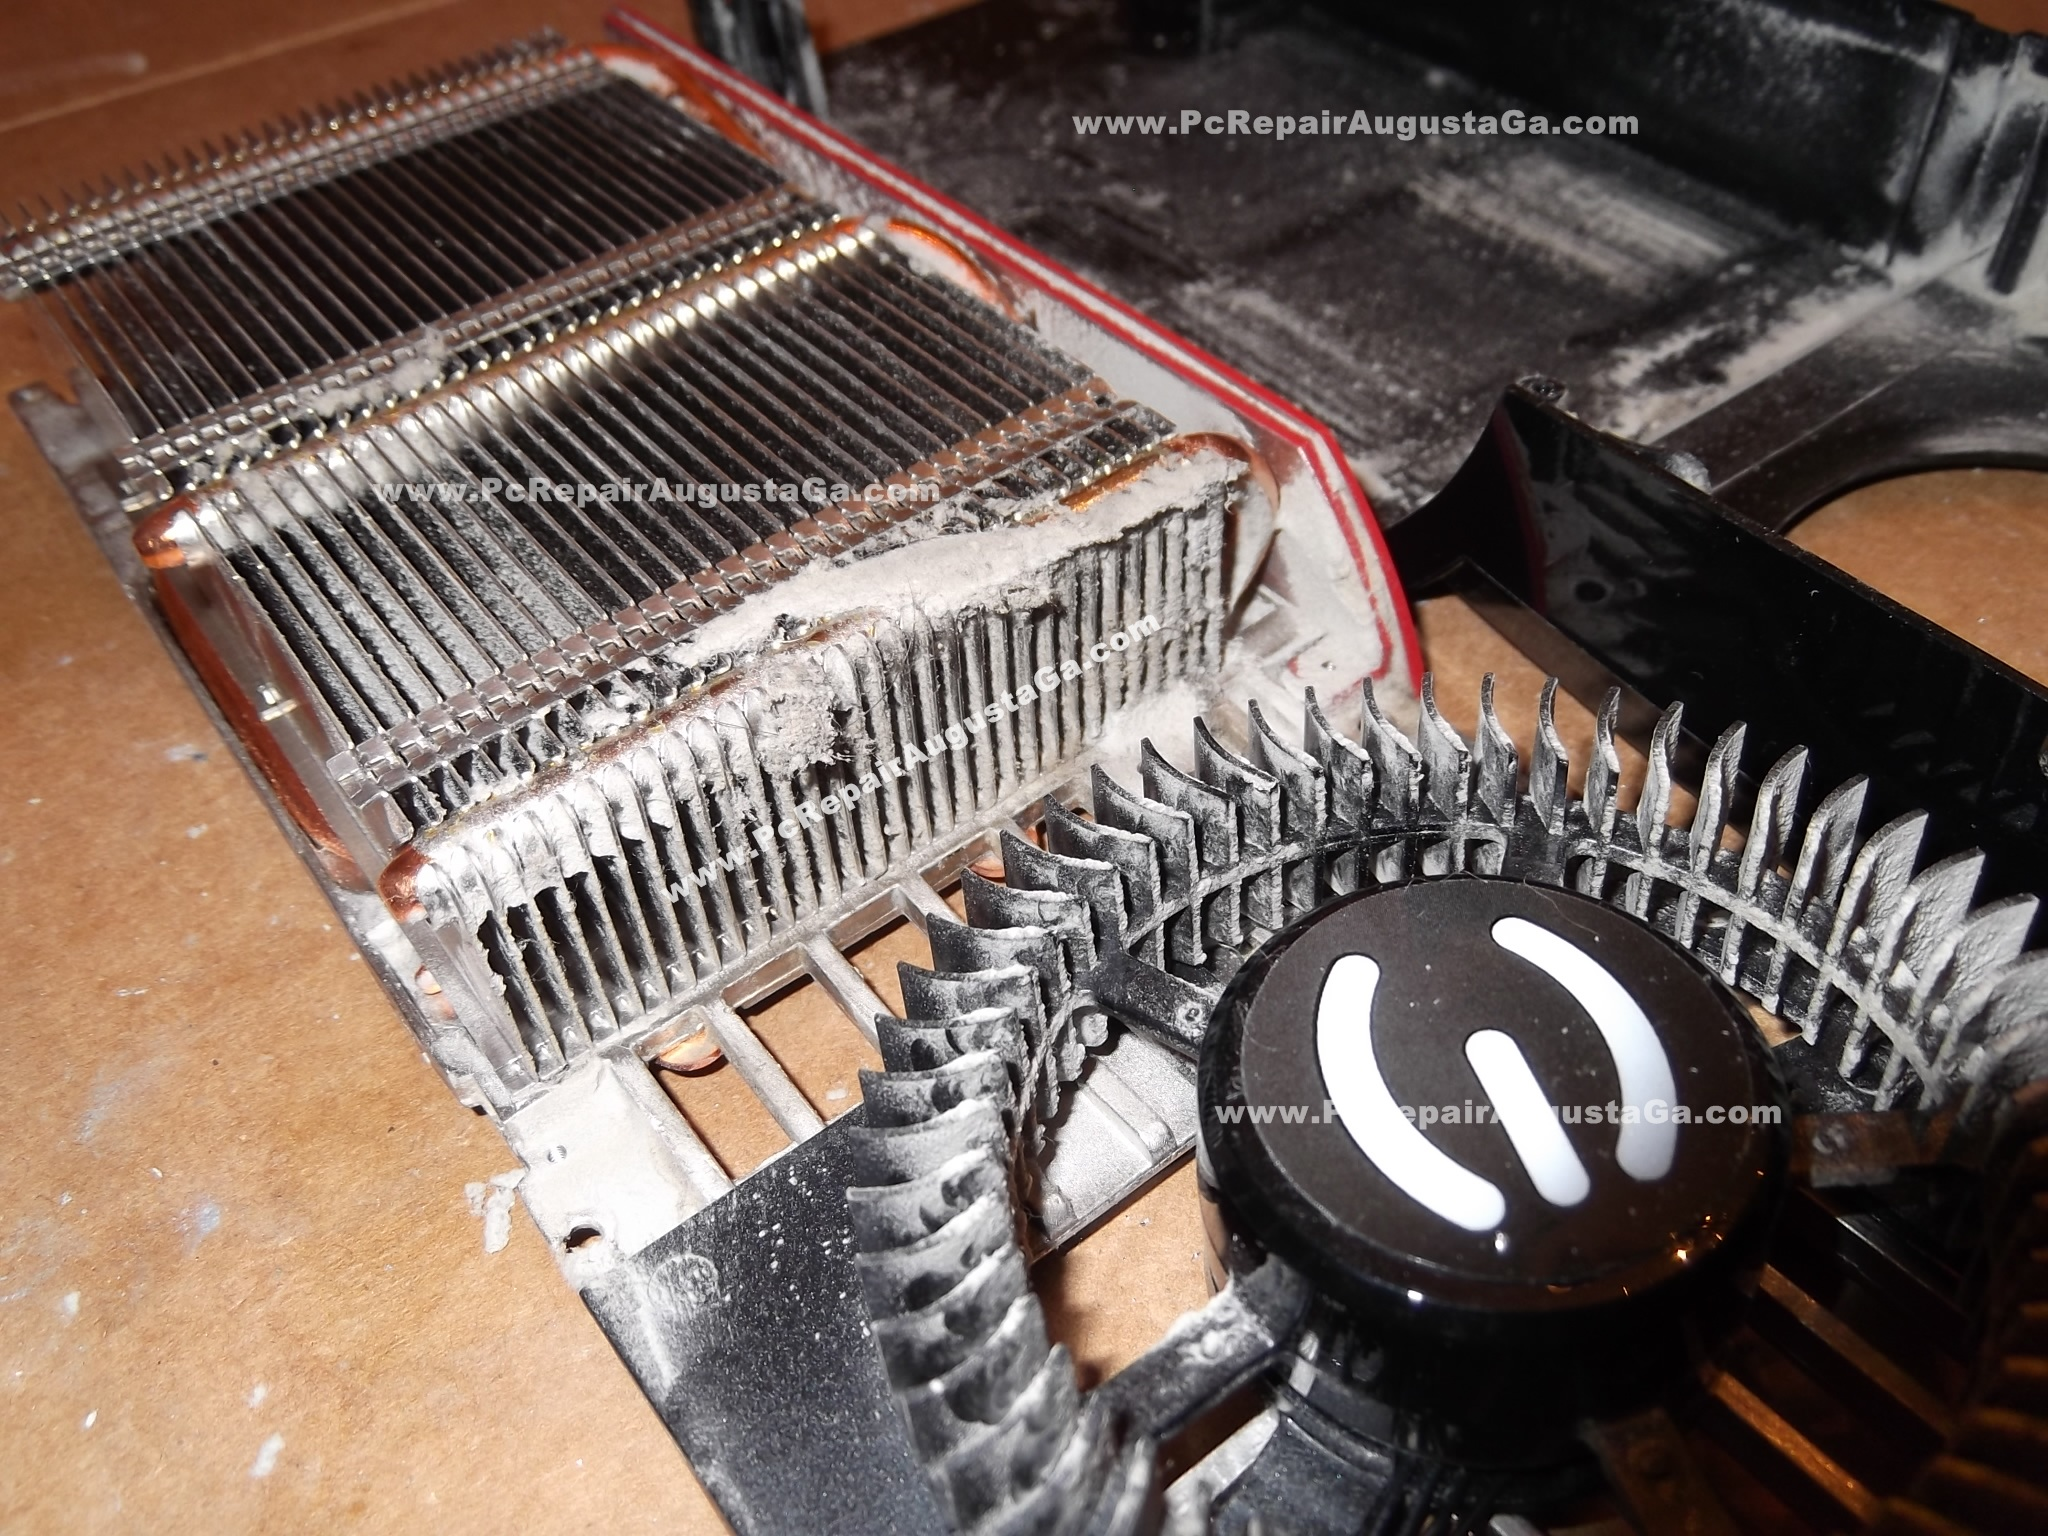 EVGA GTX 275 Overheating